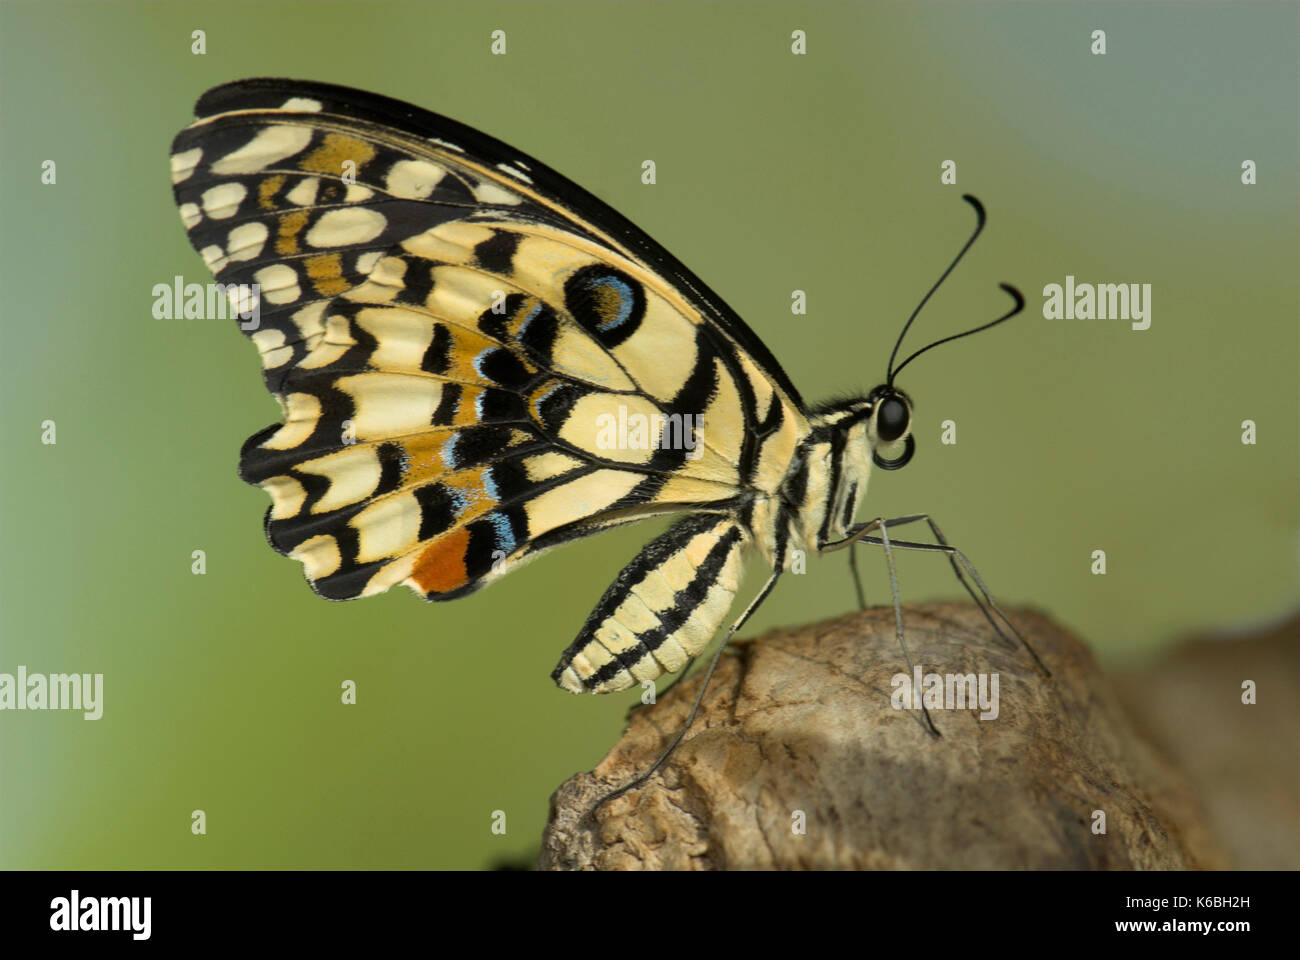 Butterfly Wings Side View